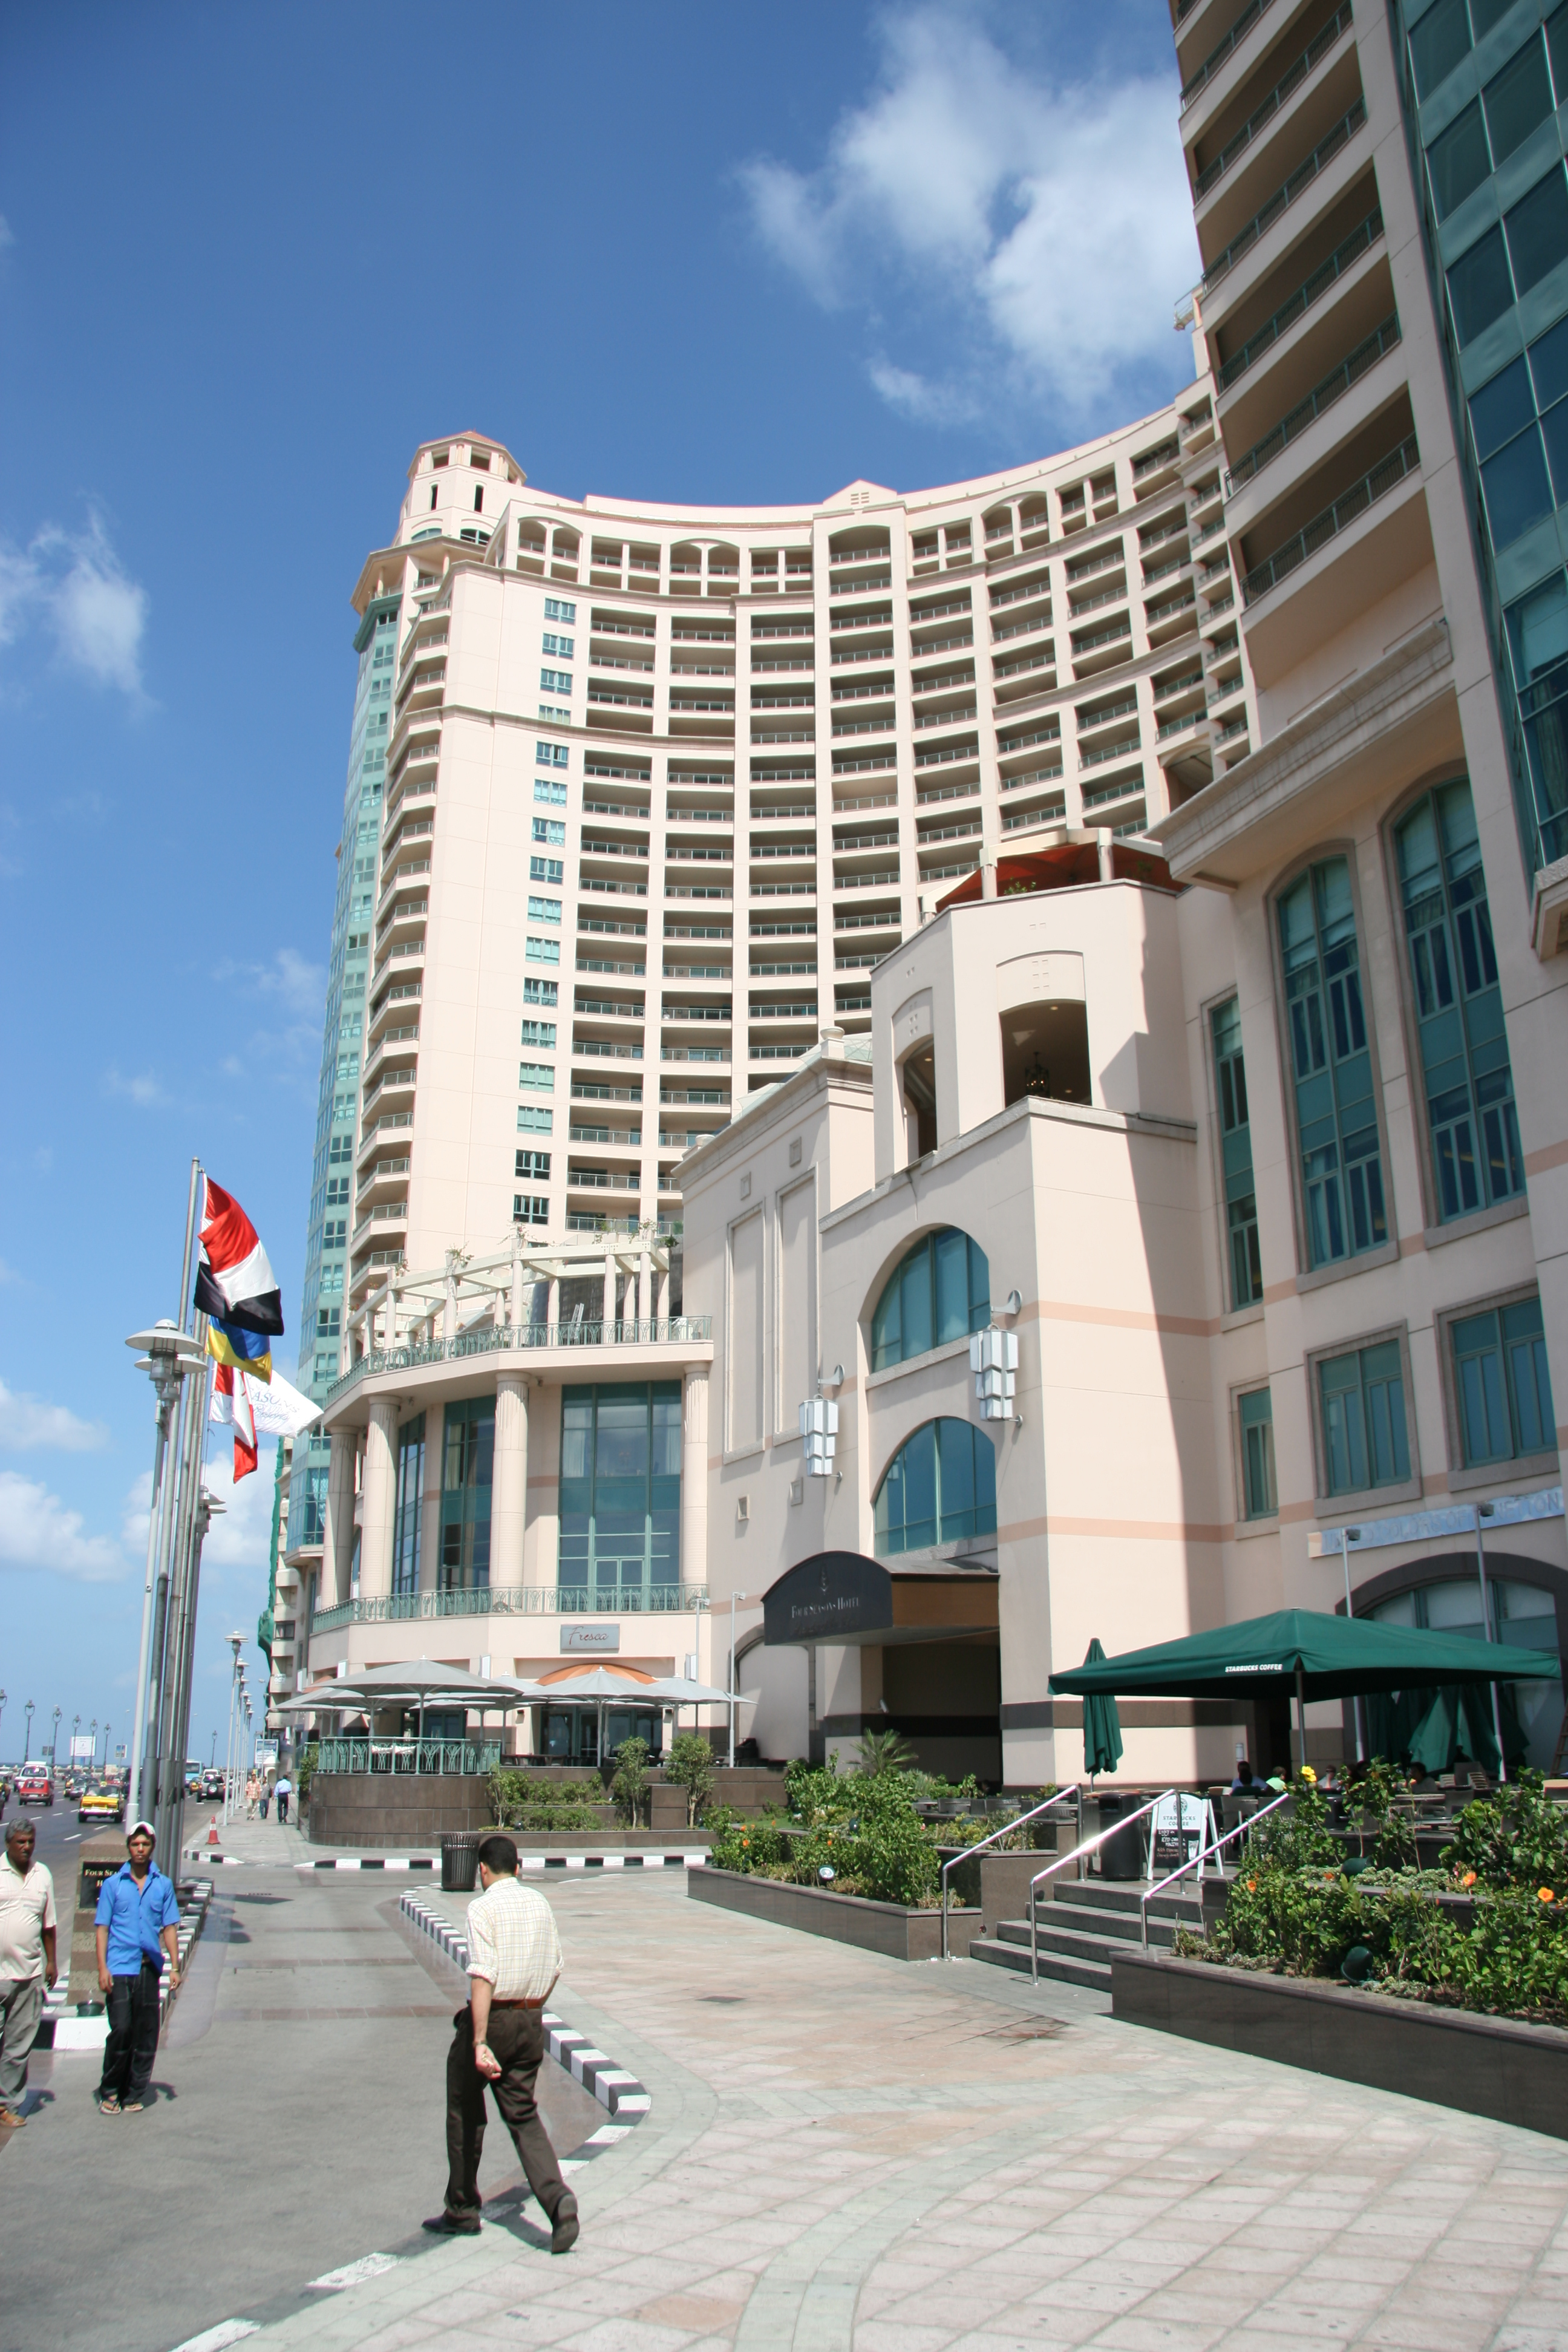 San Stefano Mall Restaurants